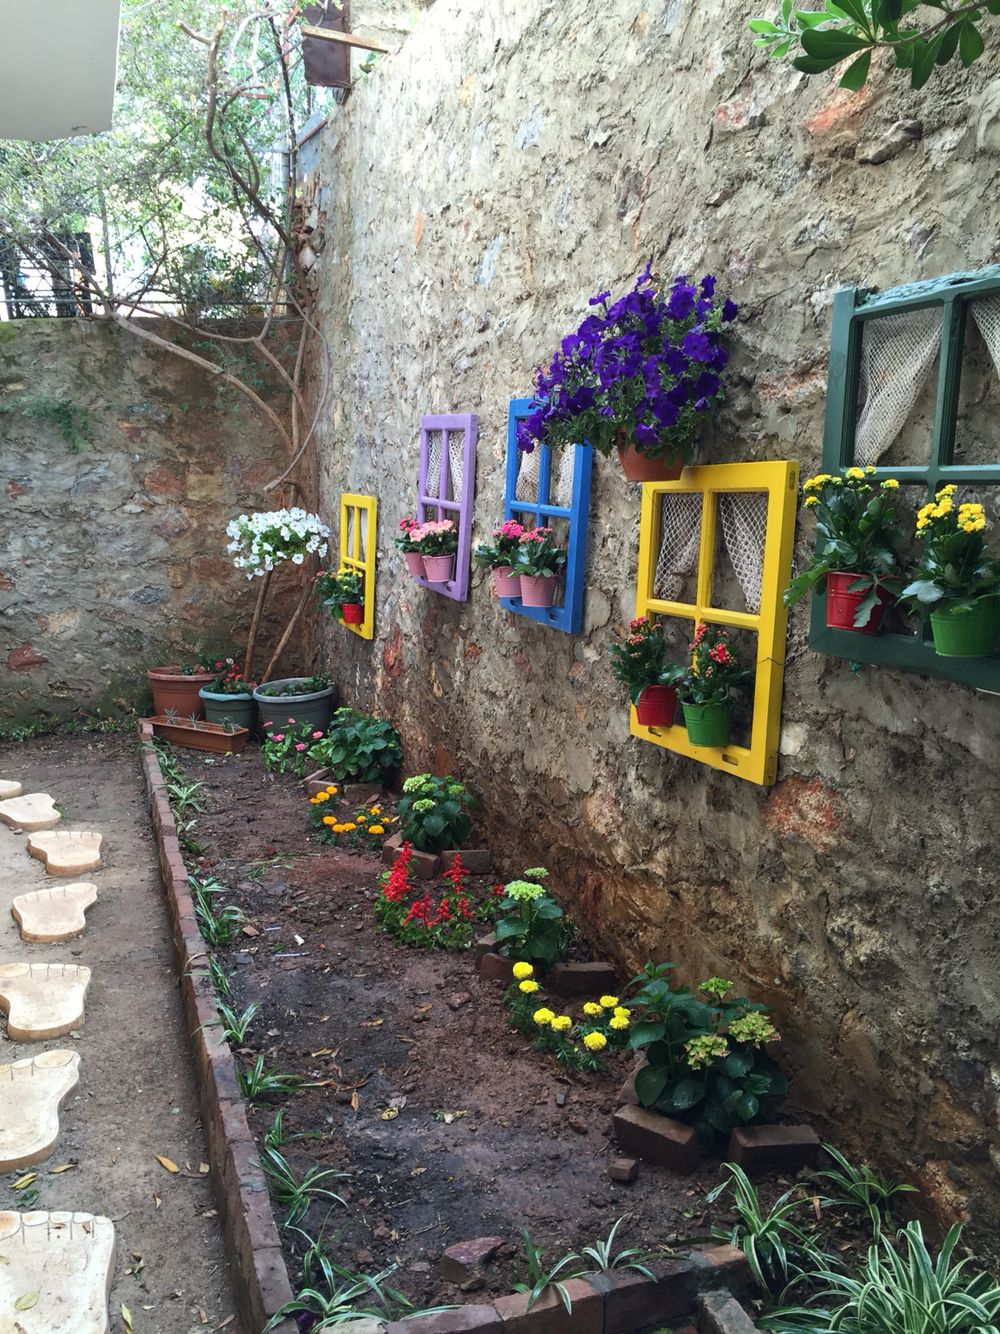 Eski ahşap pencerelerden bahçe dizaynı Bahçe #garden http://turkrazzi.com/ppost/521291725606540036/